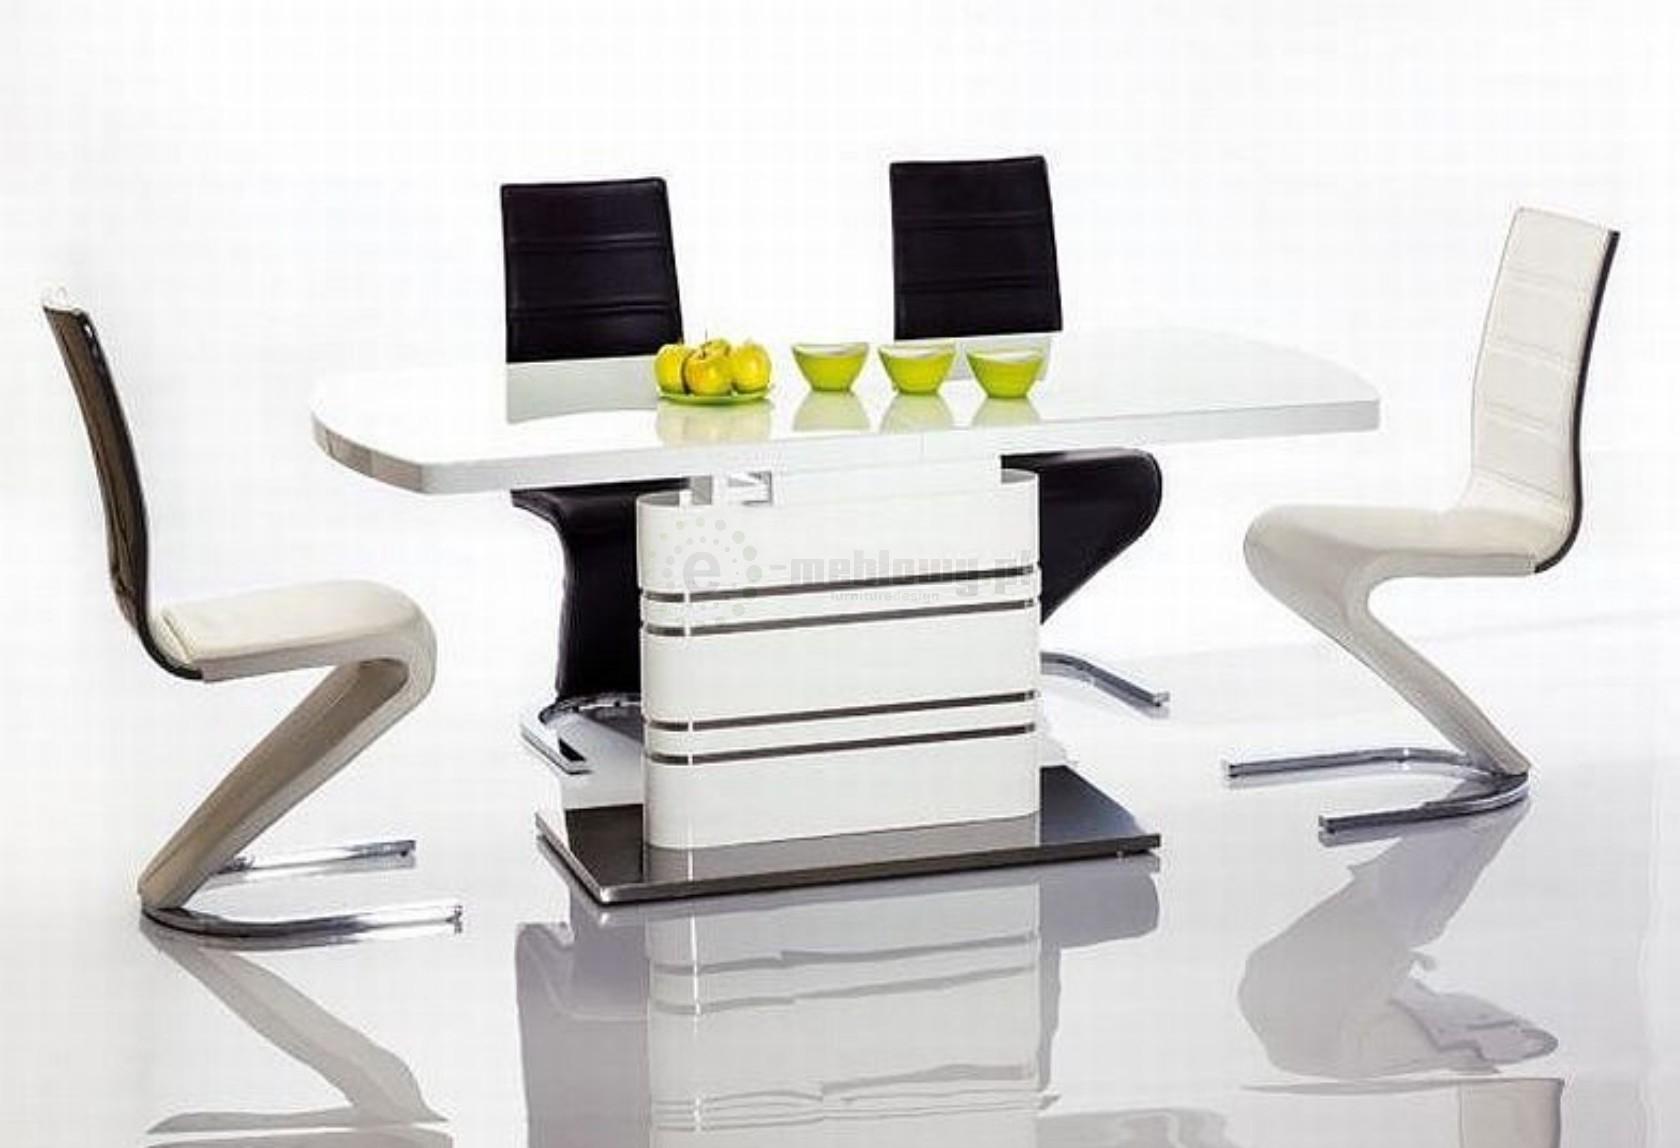 Fan nowoczesne krzeso do salonu krzeso do jadalni  : krzeslo nowoczesne bonito from e-meblowy.pl size 1680 x 1148 jpeg 179kB